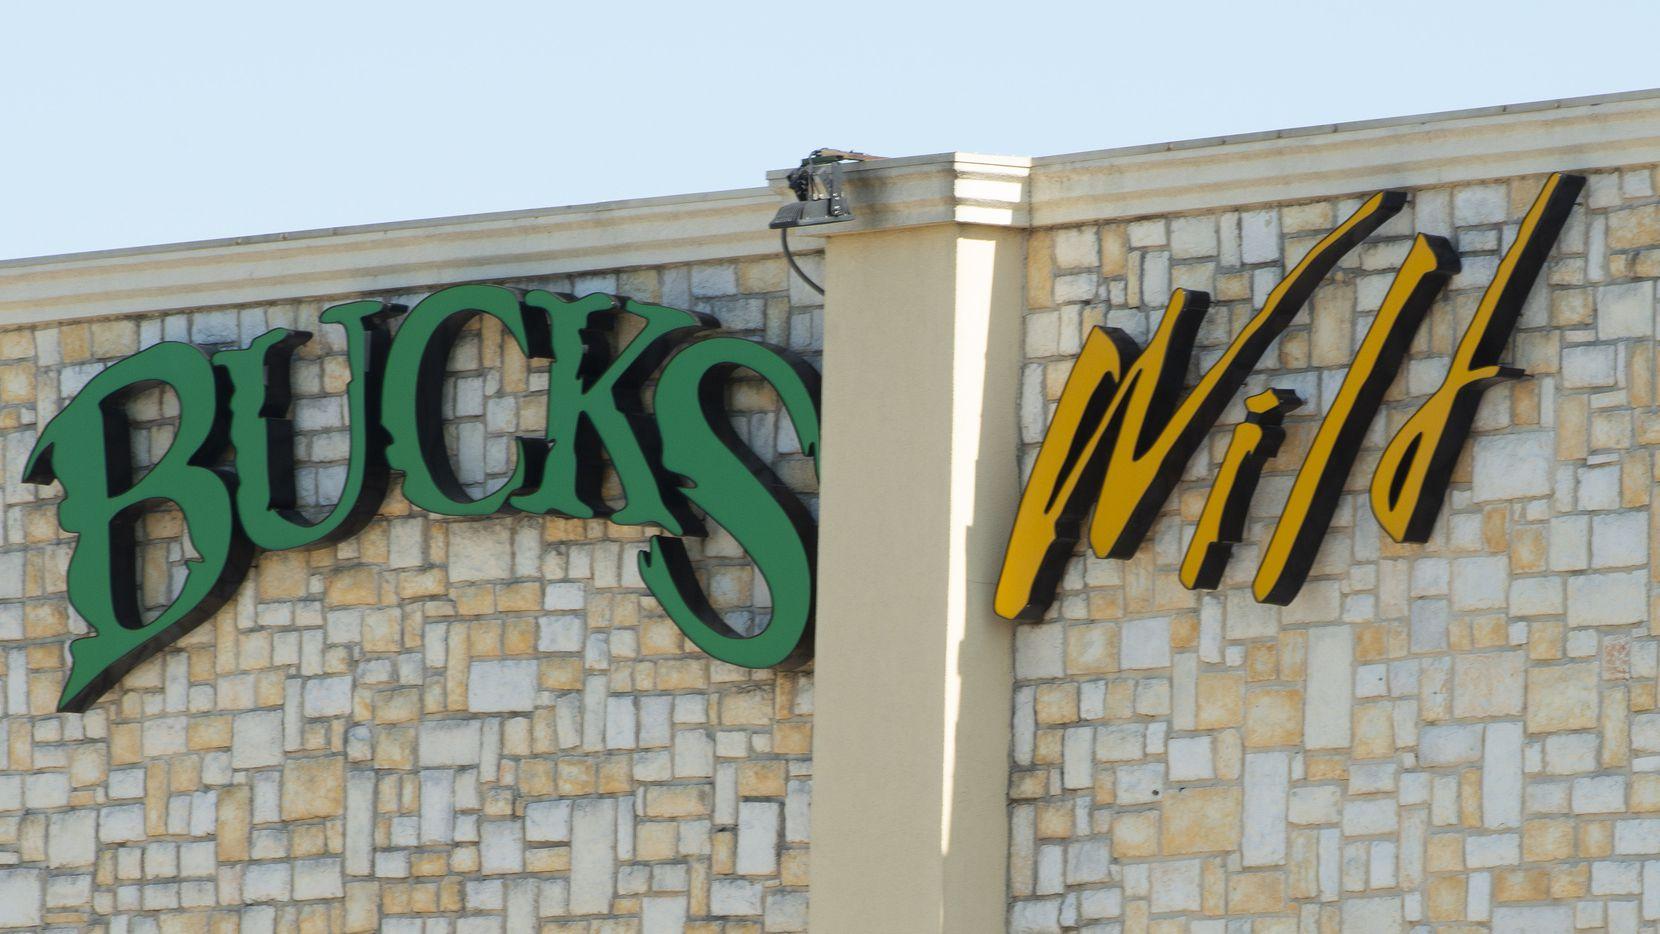 Bucks Wild en Fort Worth es un strip club en Fort Worth.